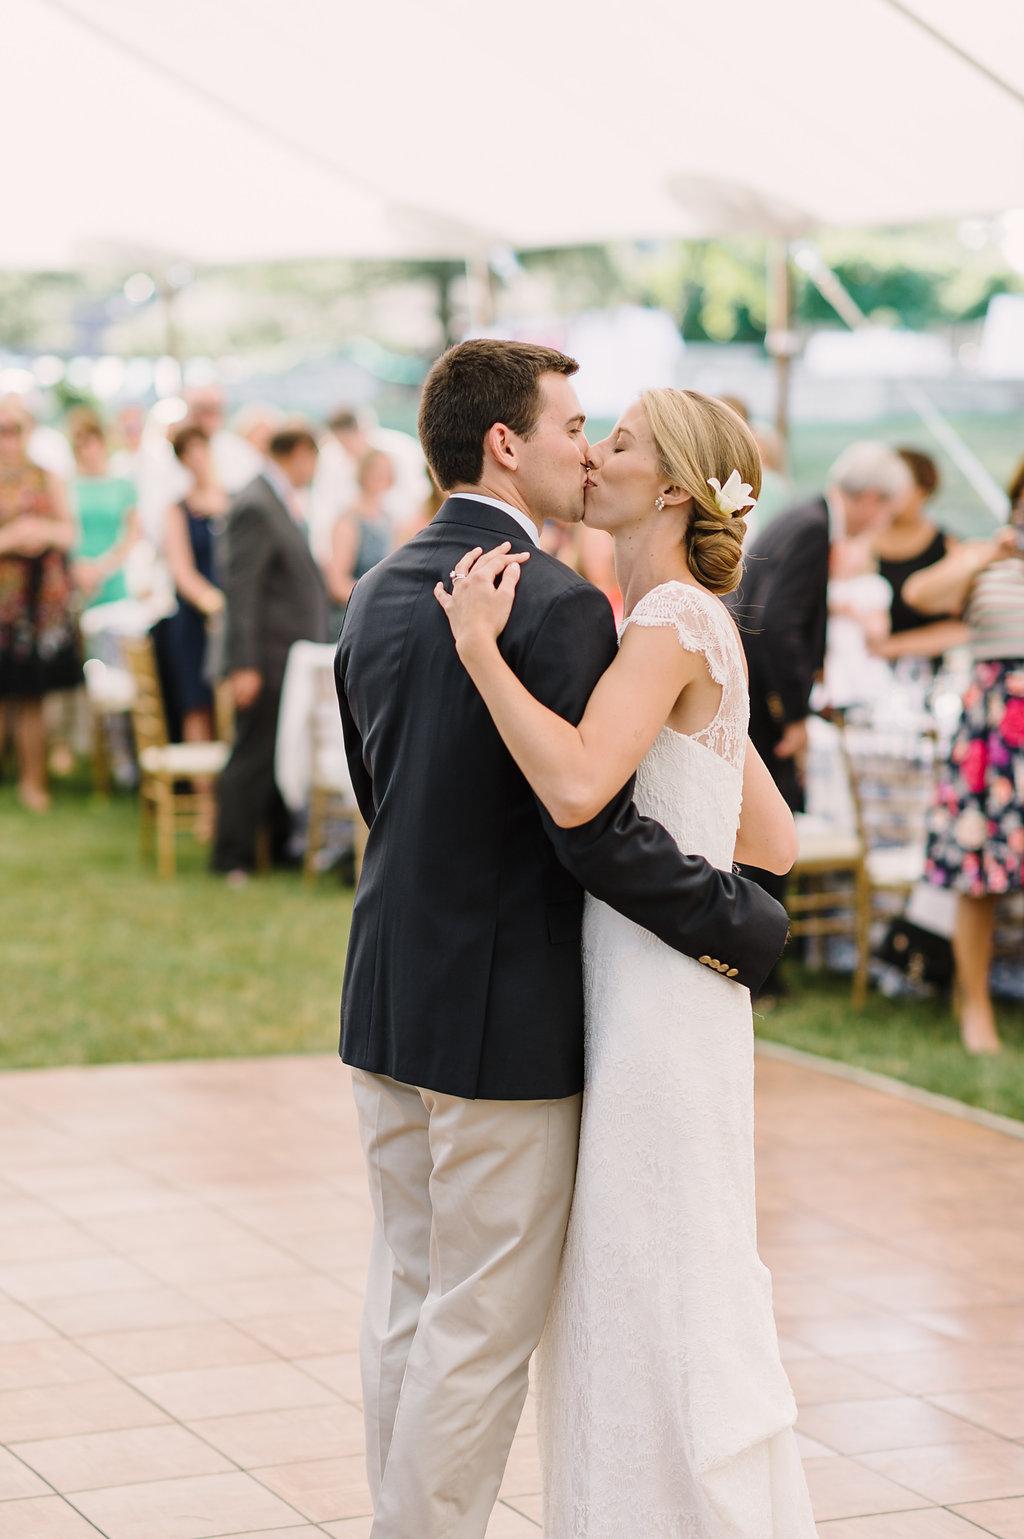 Cameron-Powel-Wes-Mize-wedding-20160618-507.jpg